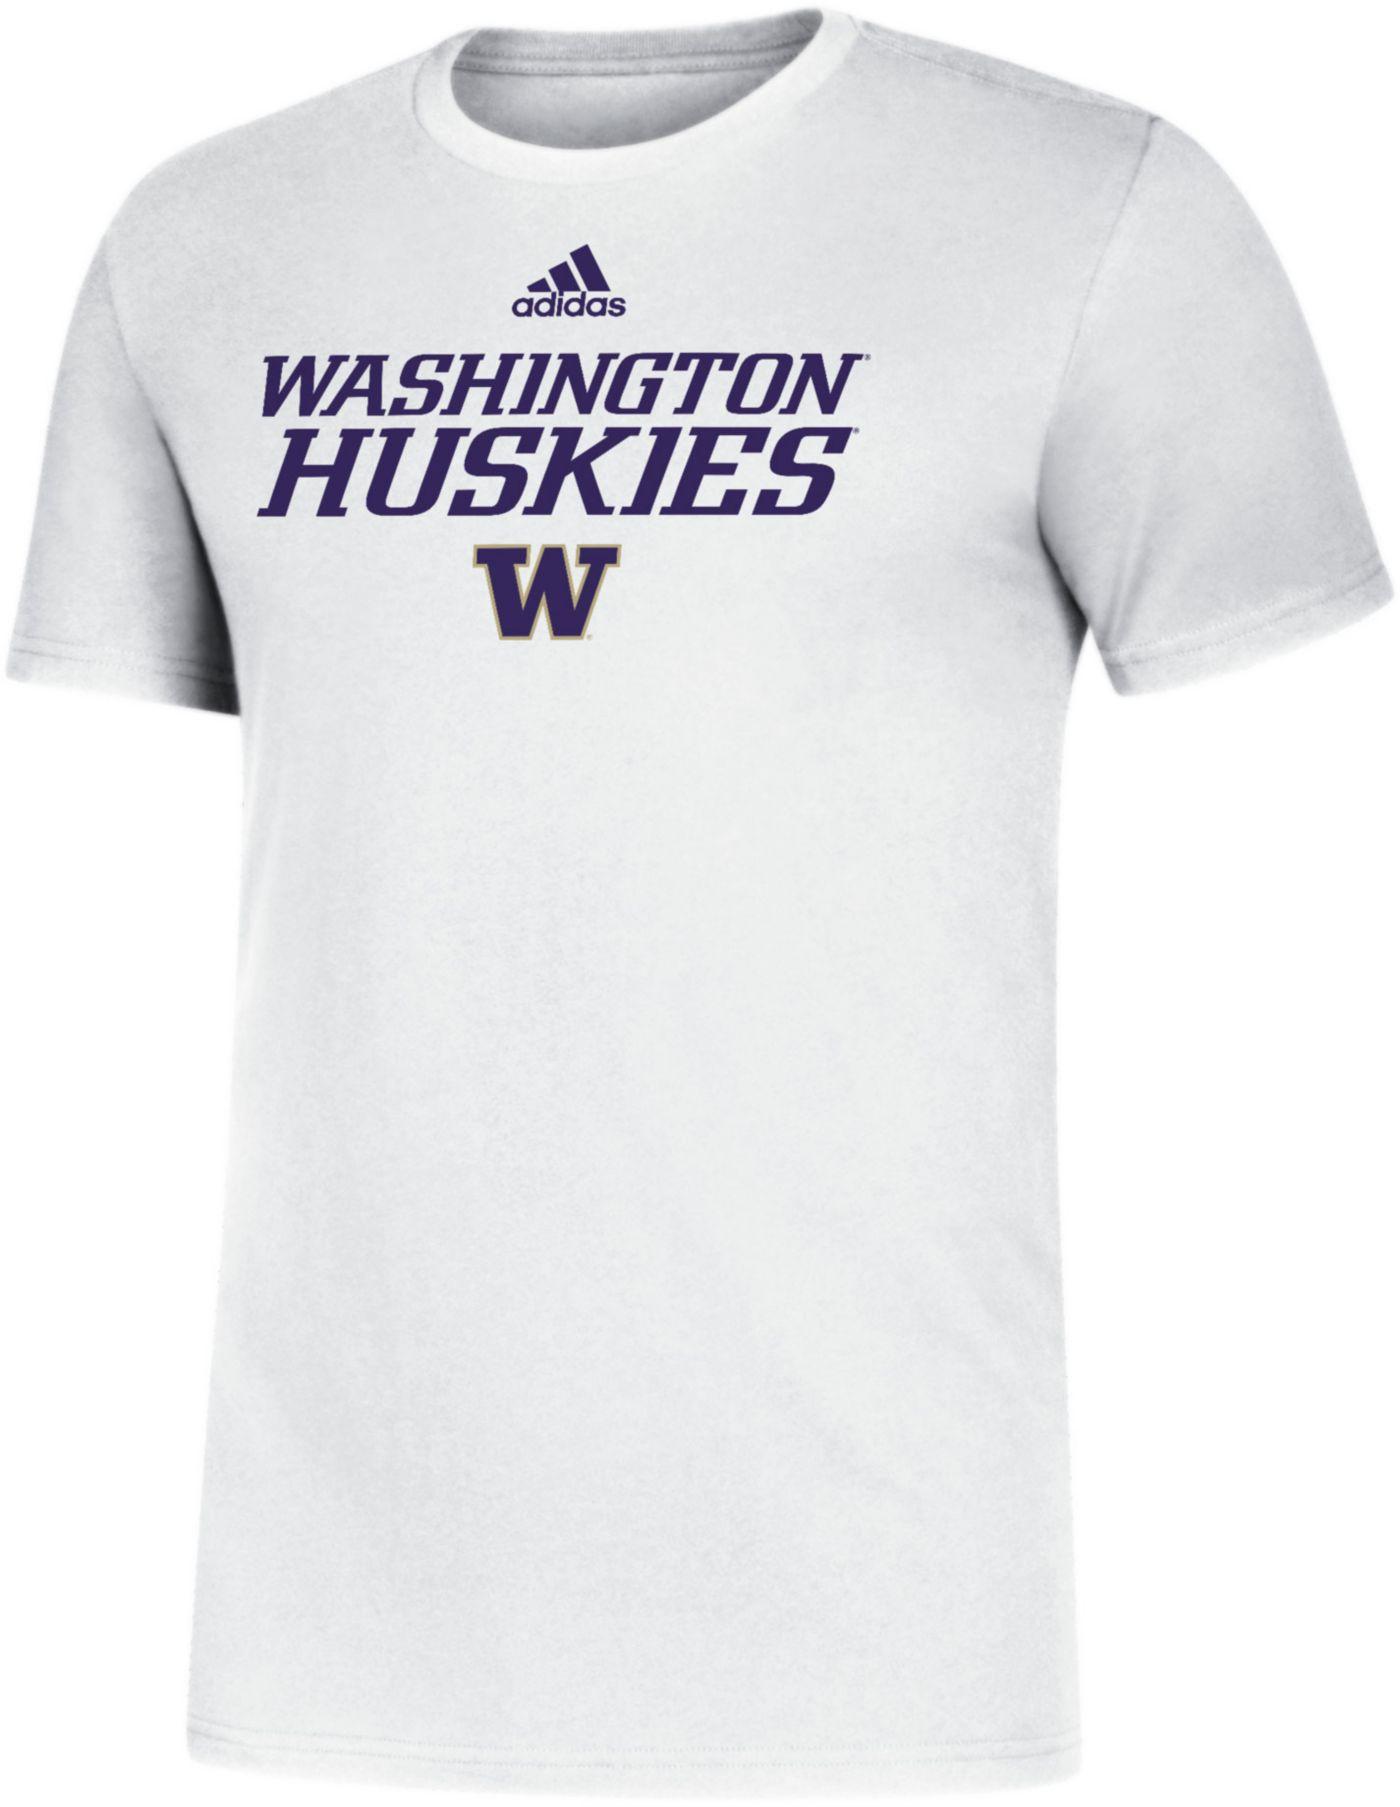 adidas Men's Washington Huskies Sideline Locker Stacked White T-Shirt